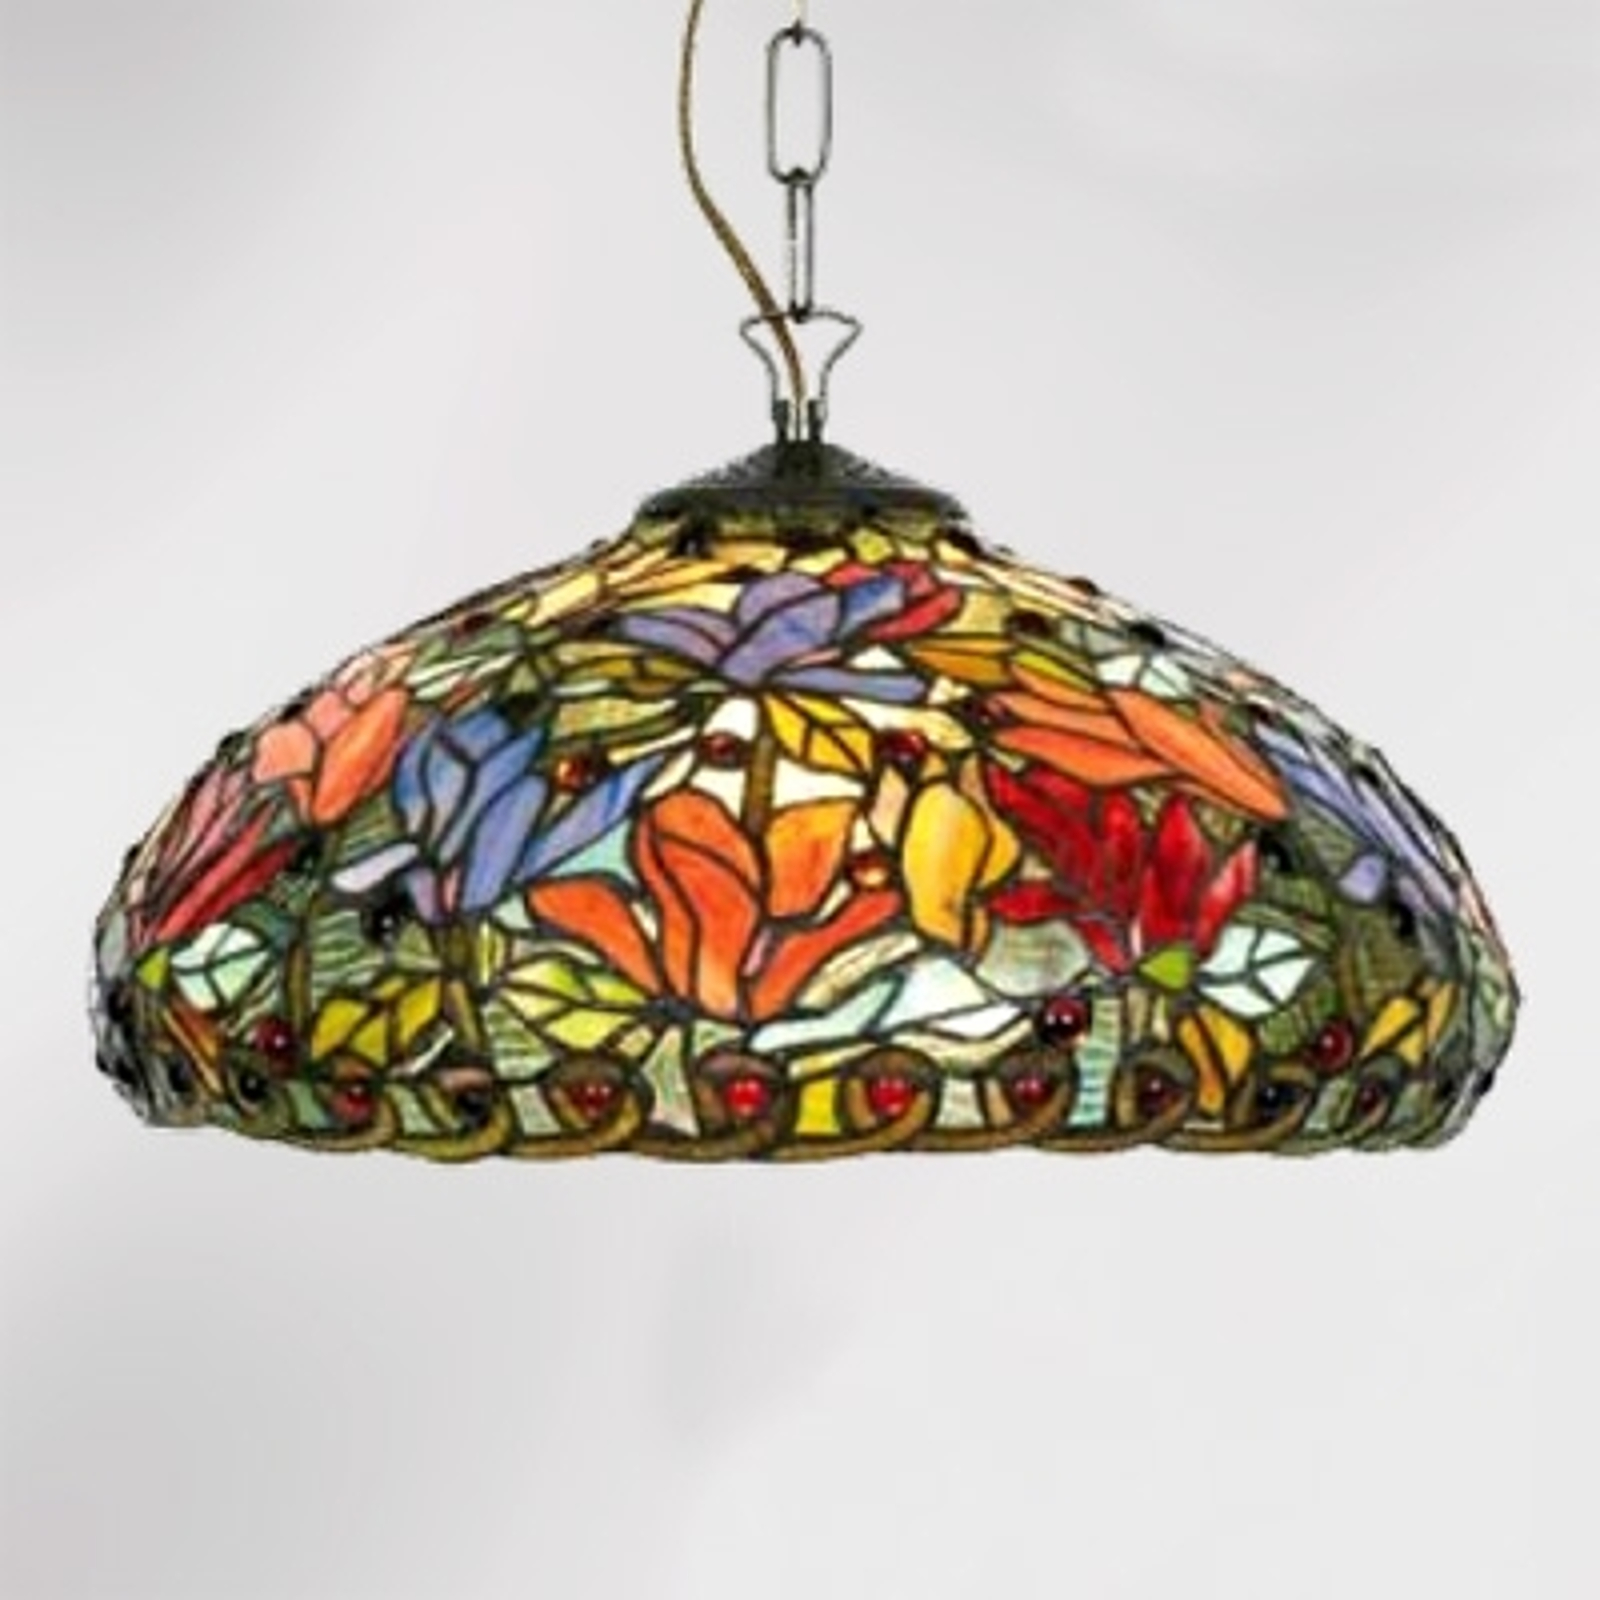 Hanglamp Elaine bloemrijke Tiffany-stijl 2xE27